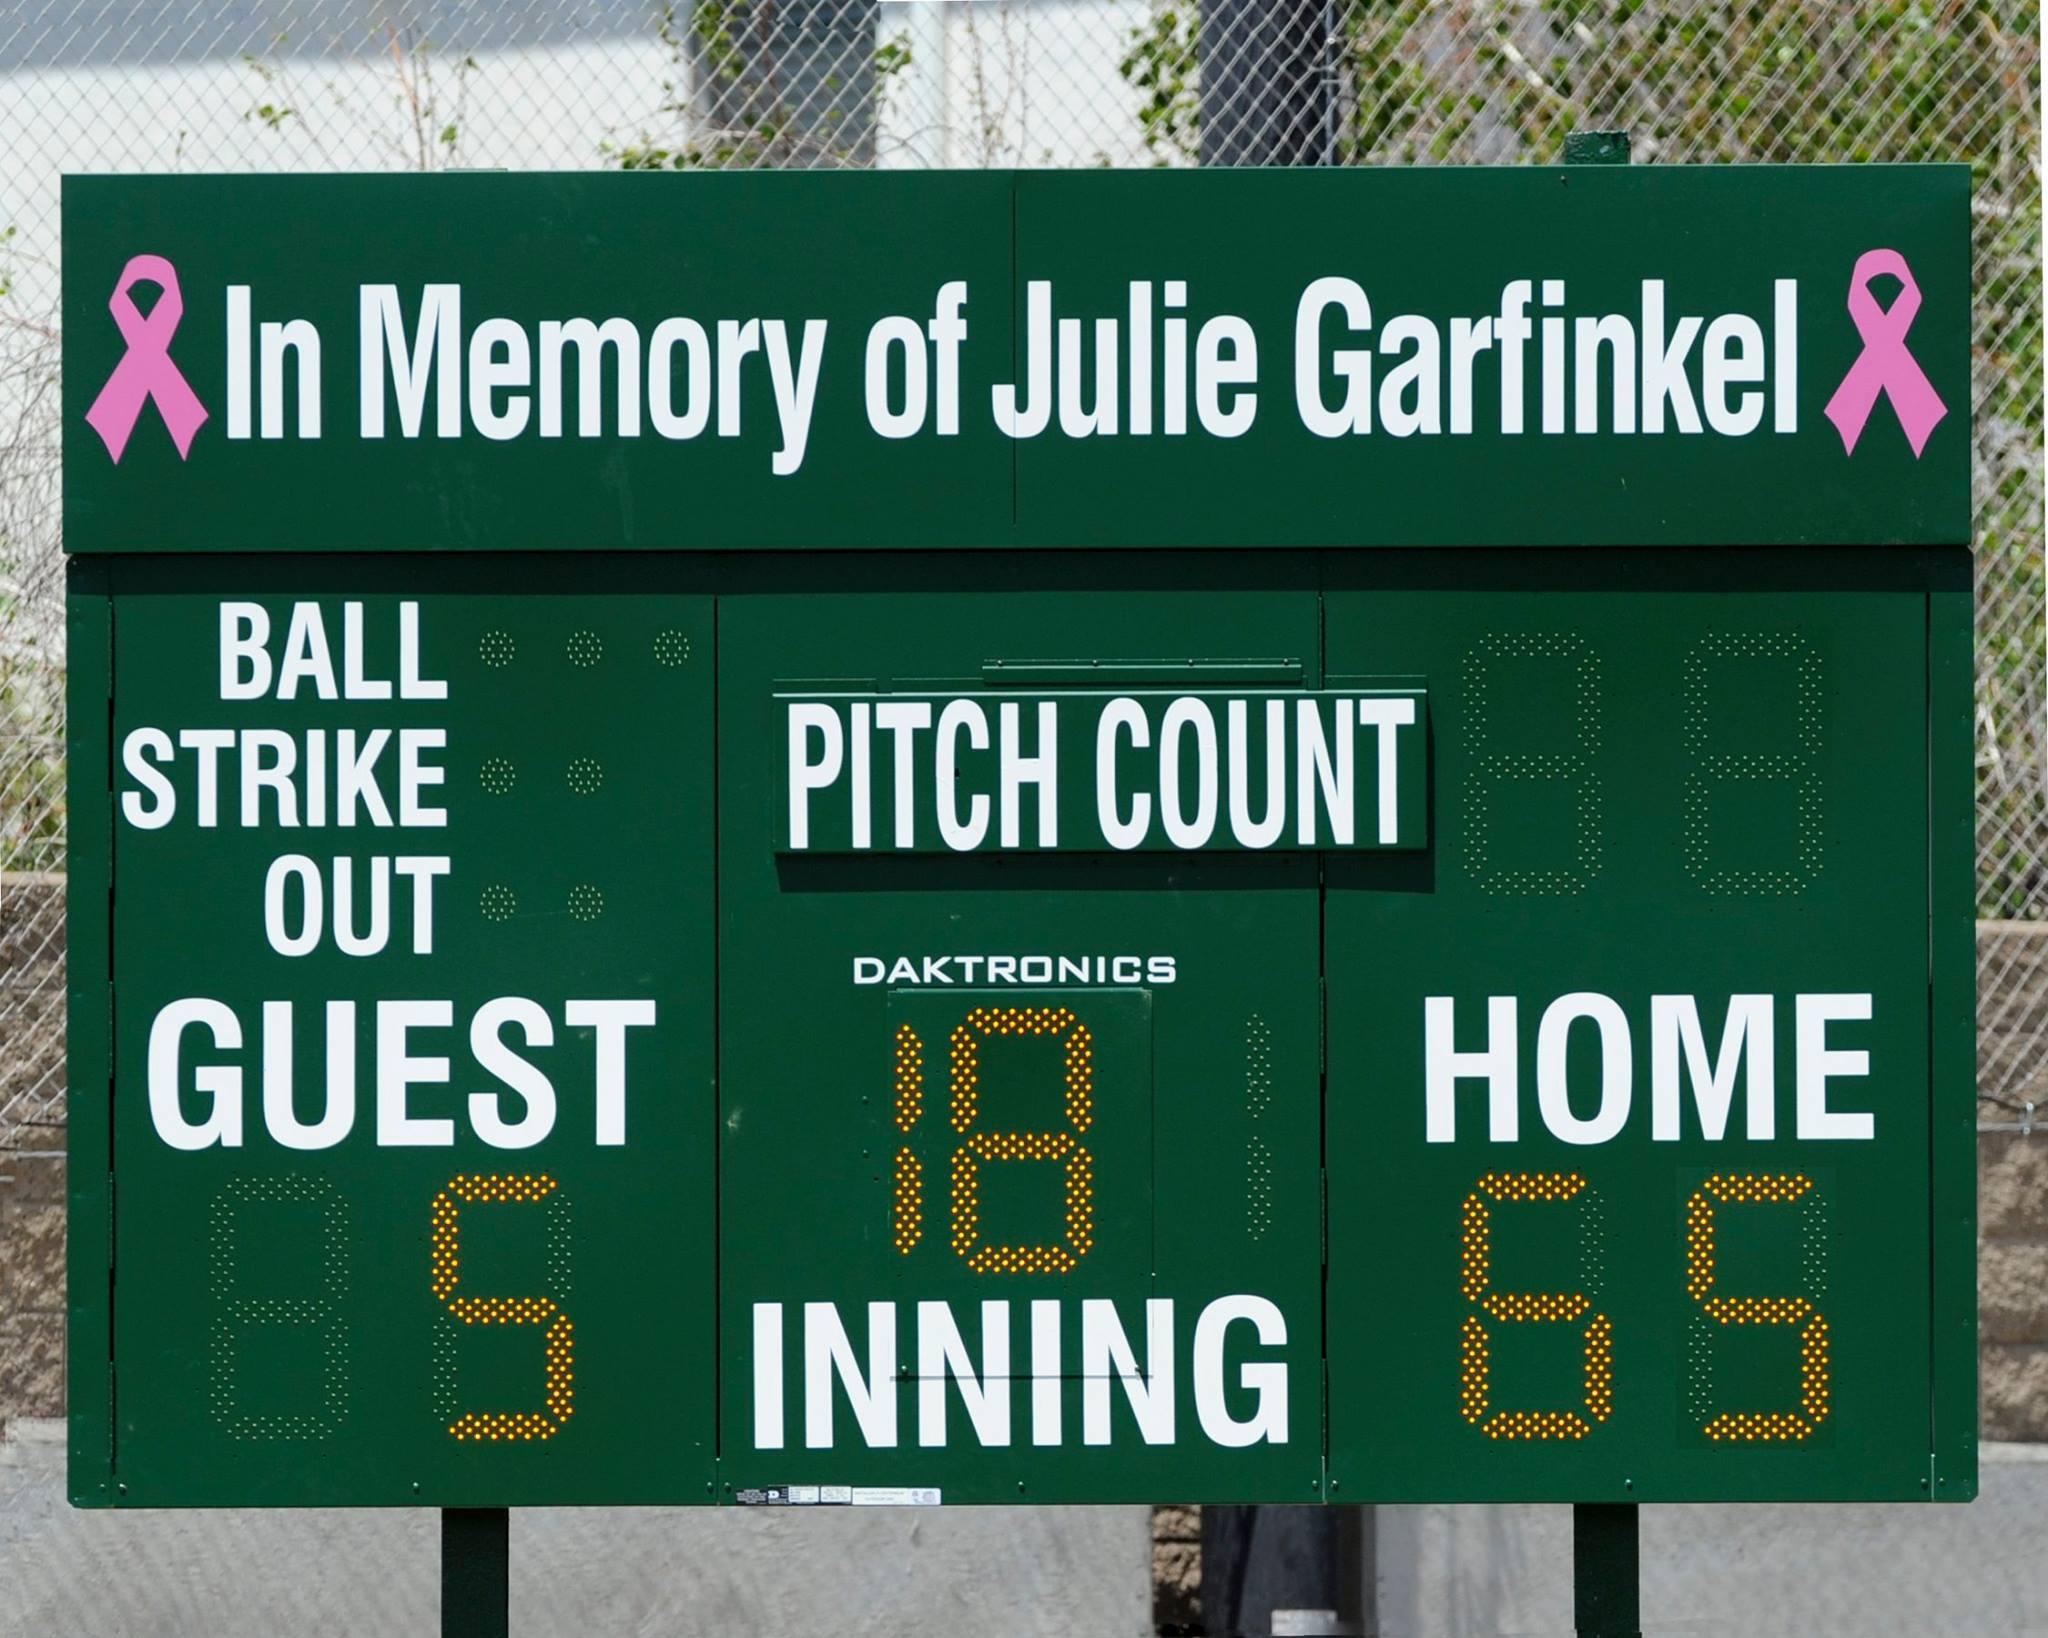 julie garfinkel memorial scoreboard